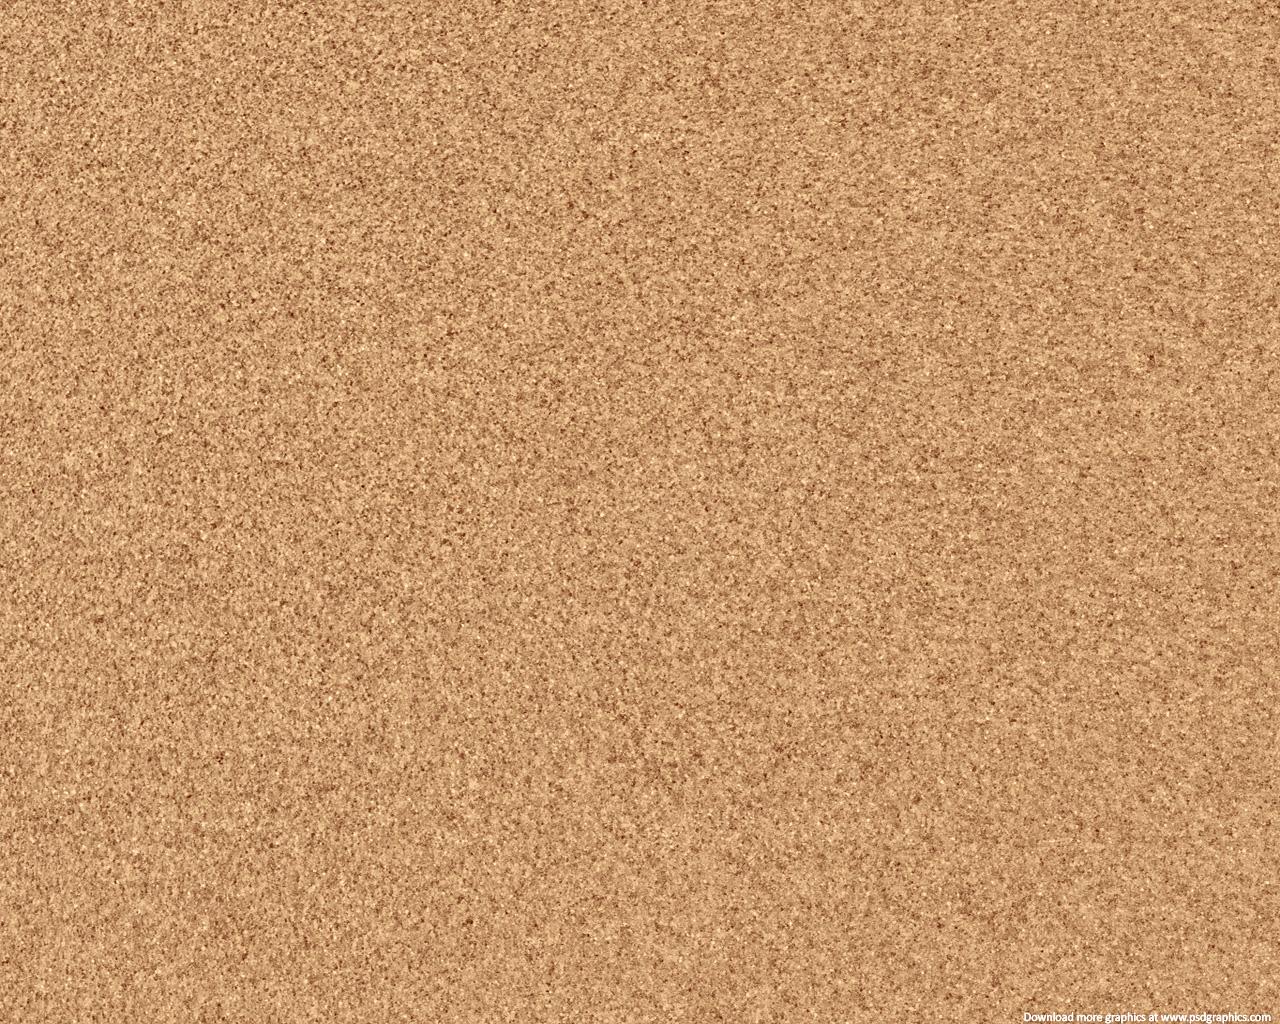 cork texture psdgraphics